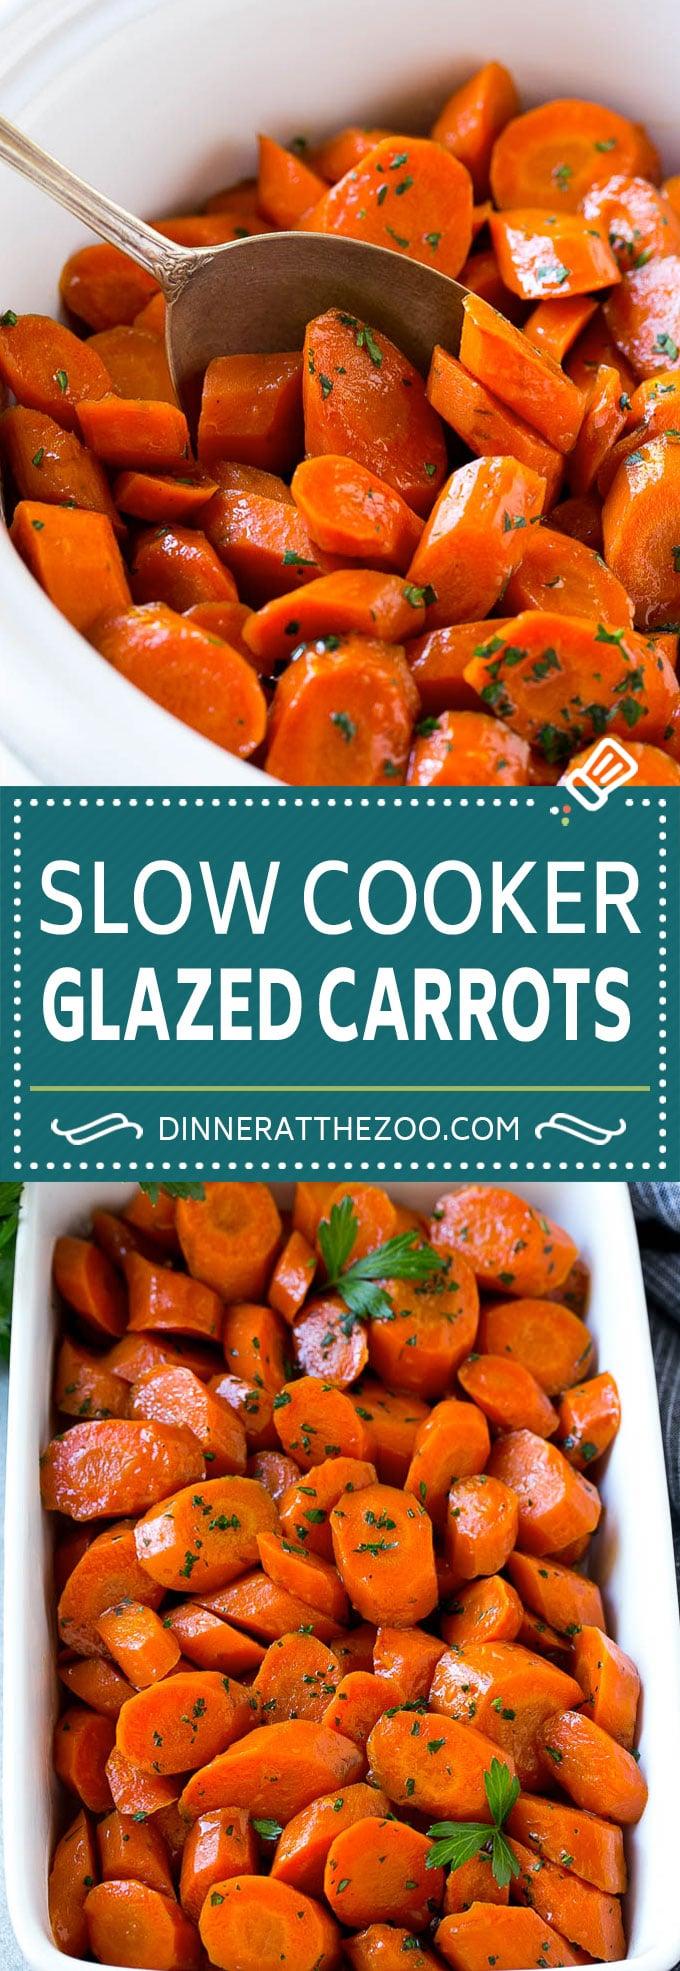 Slow Cooker Glazed Carrots Recipe   Brown Sugar Glazed Carrots   Slow Cooker Carrots #carrots #sidedish #slowcooker #crockpot #dinneratthezoo